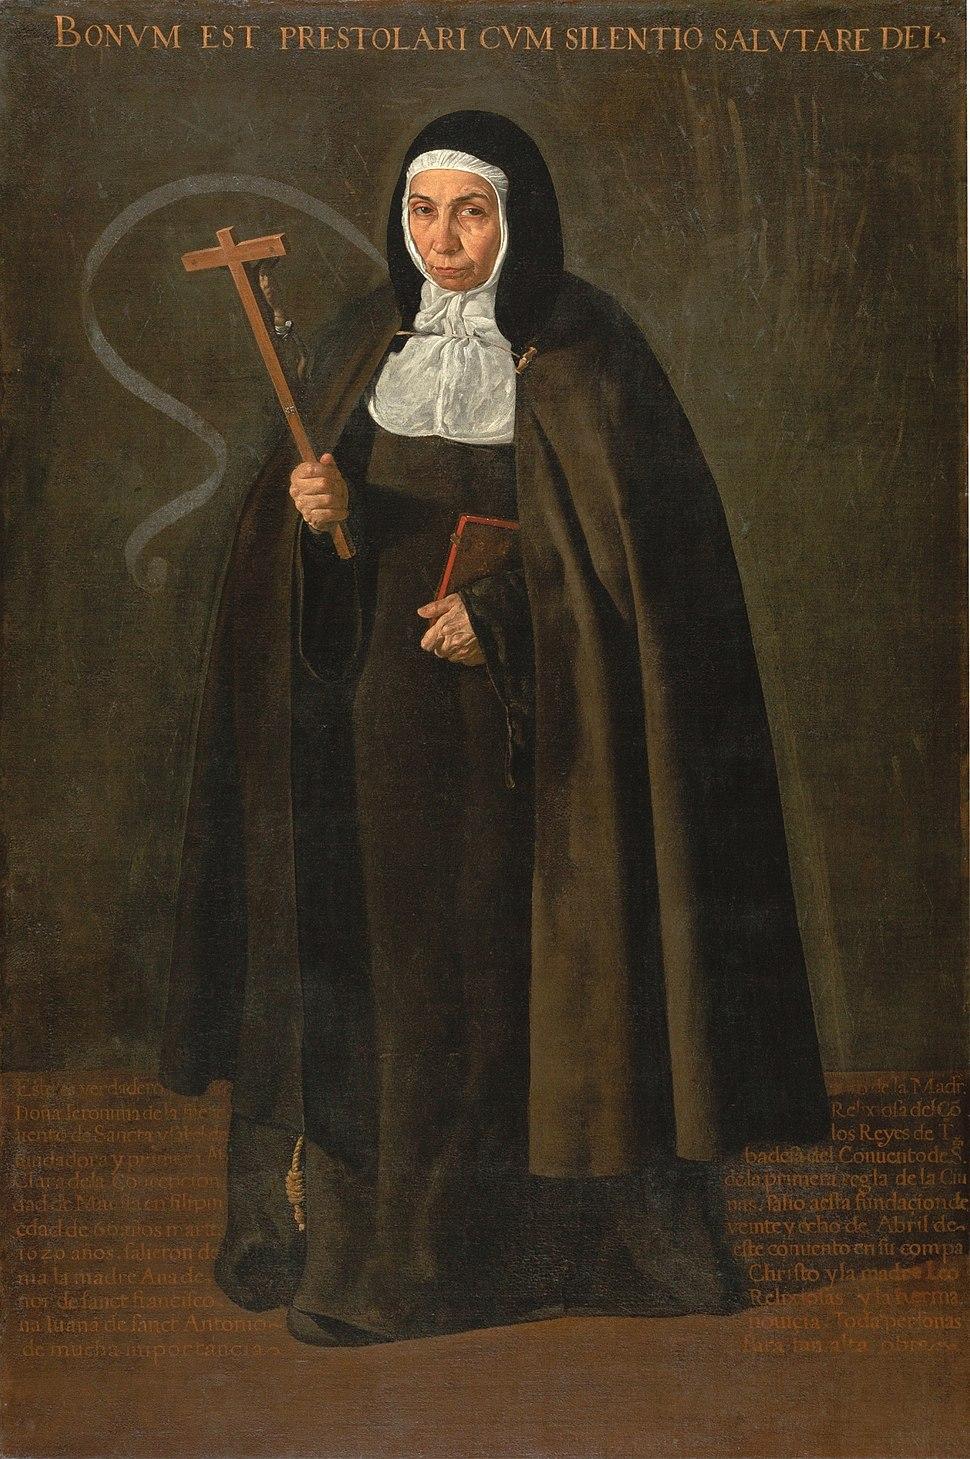 Madre Jerónima de la Fuente, by Diego Velázquez